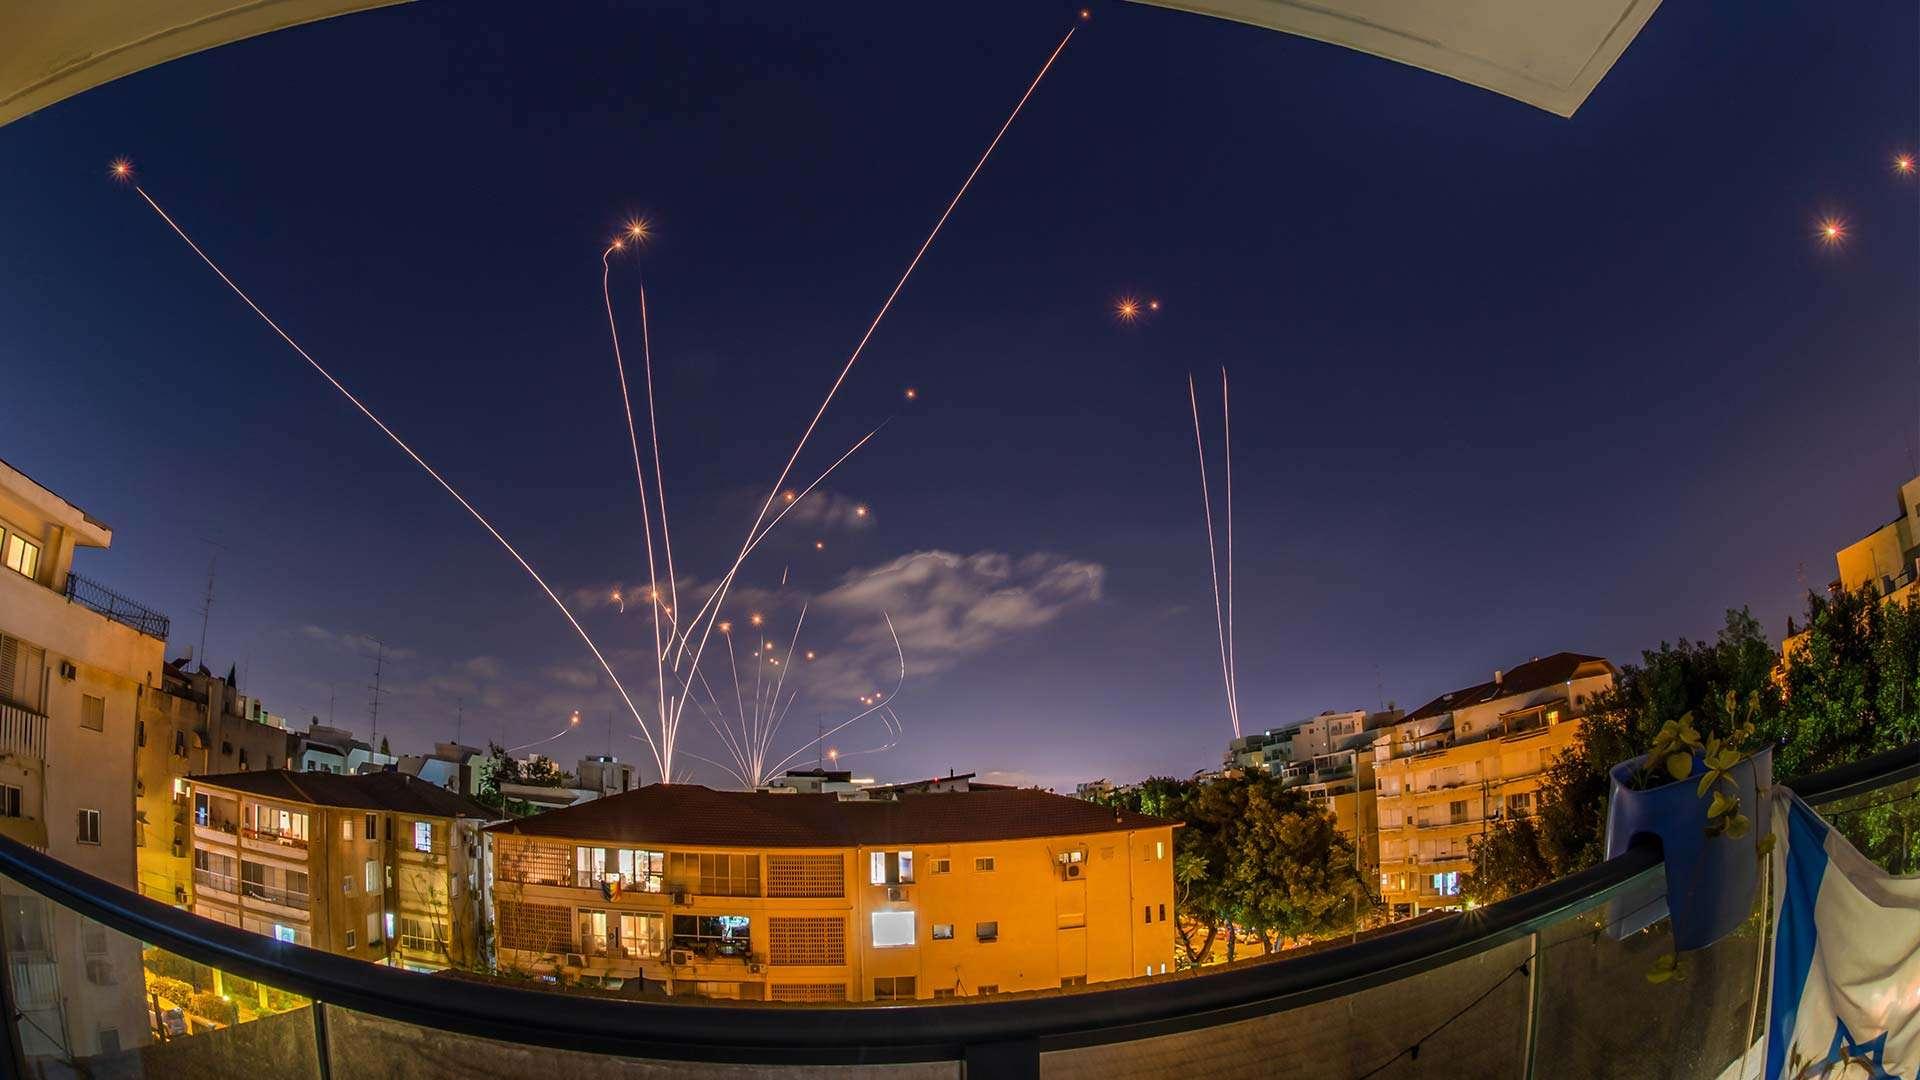 Iron Dome Rocket Interceptions of Hamas Rockets